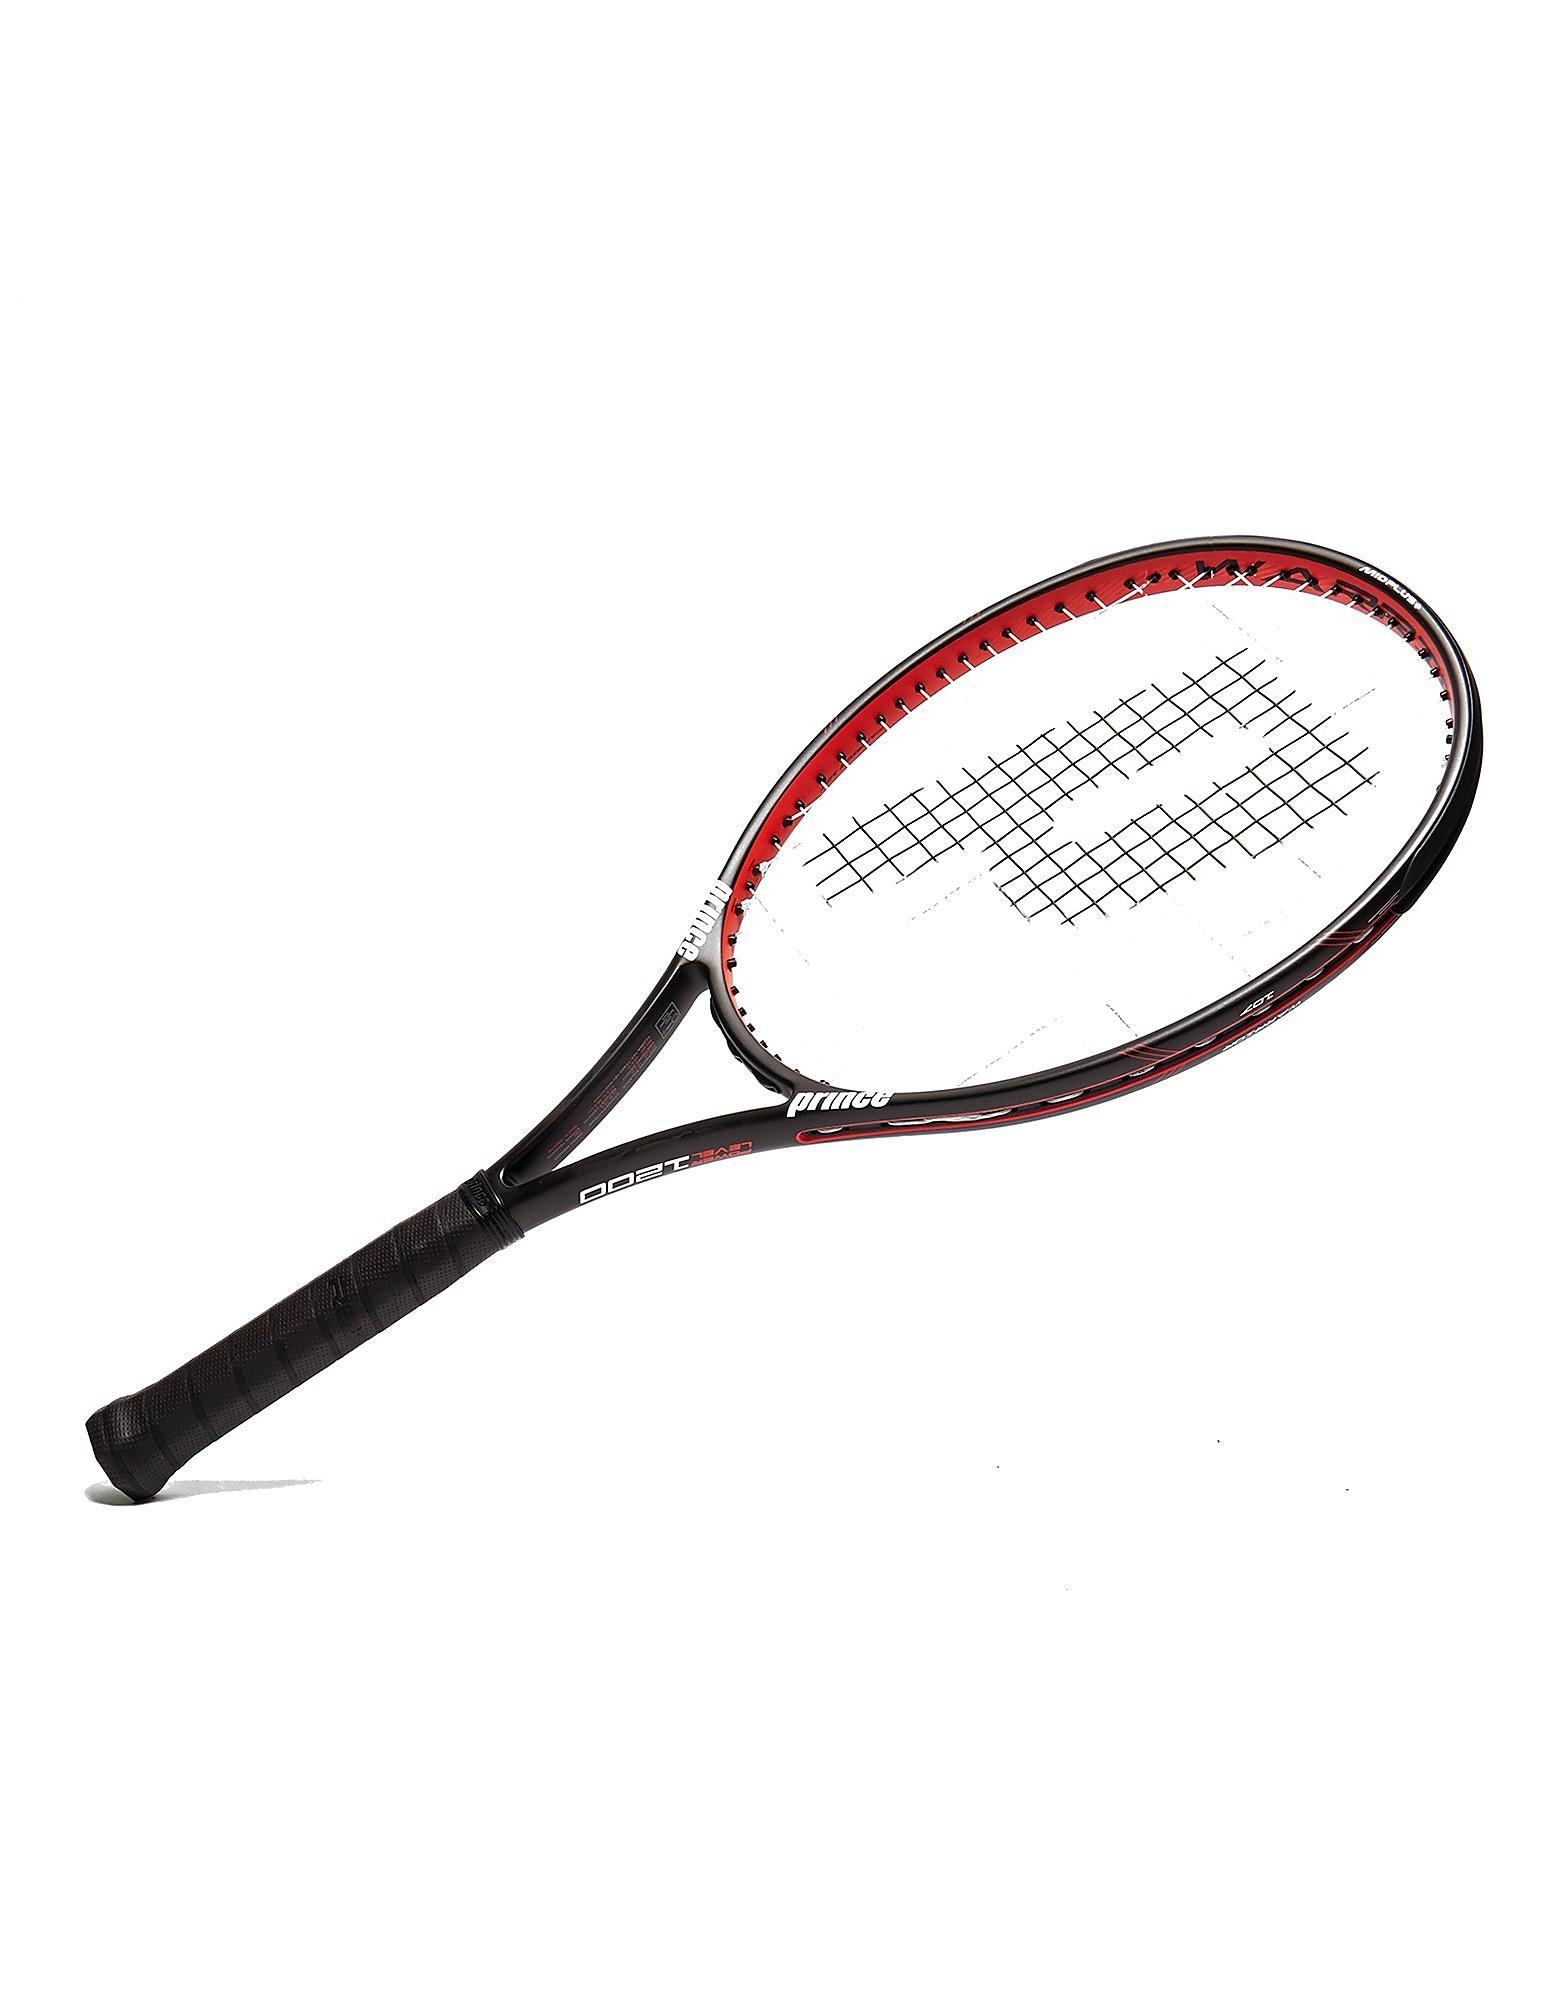 Prince Warrior 107 Racket